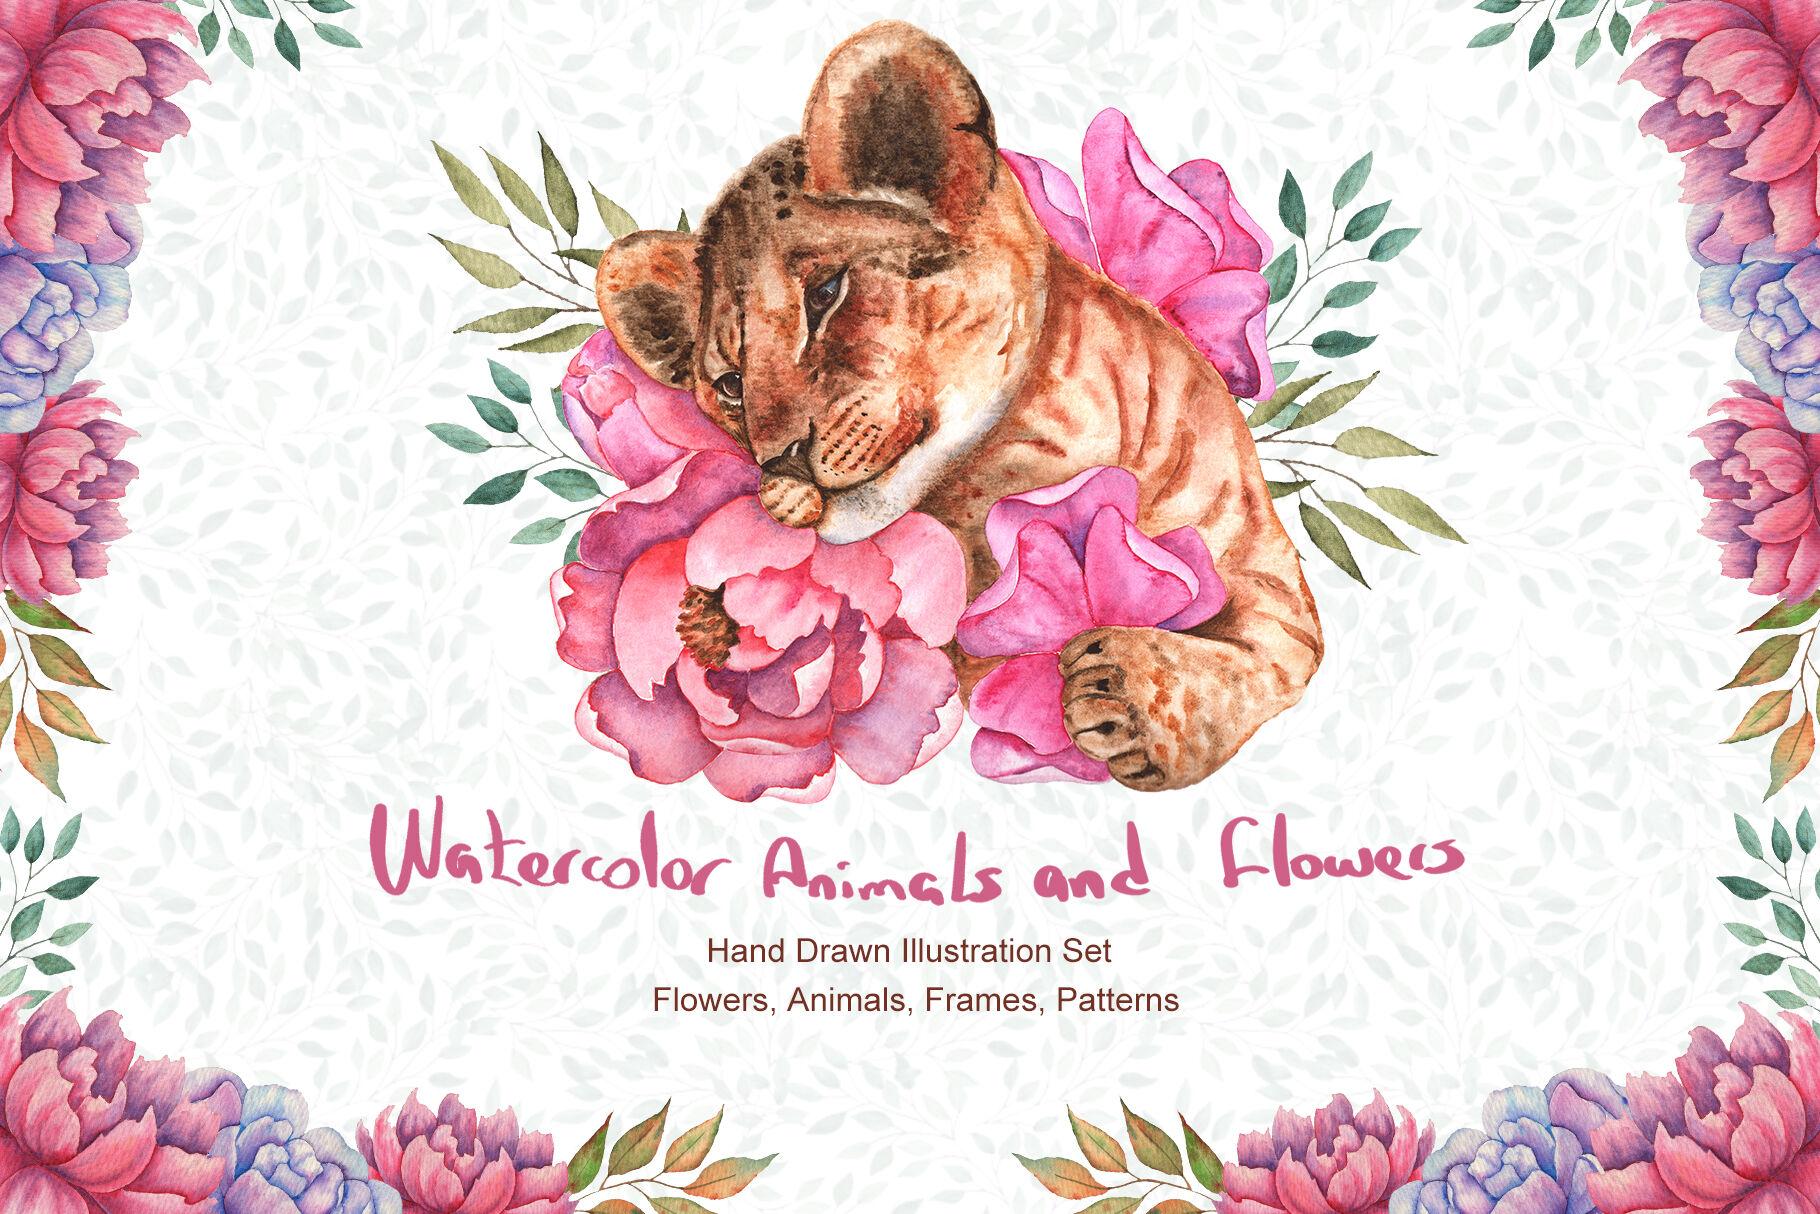 高清手绘花卉和动物水彩画图片集 Watercolor Flowers and Animals Set插图(9)